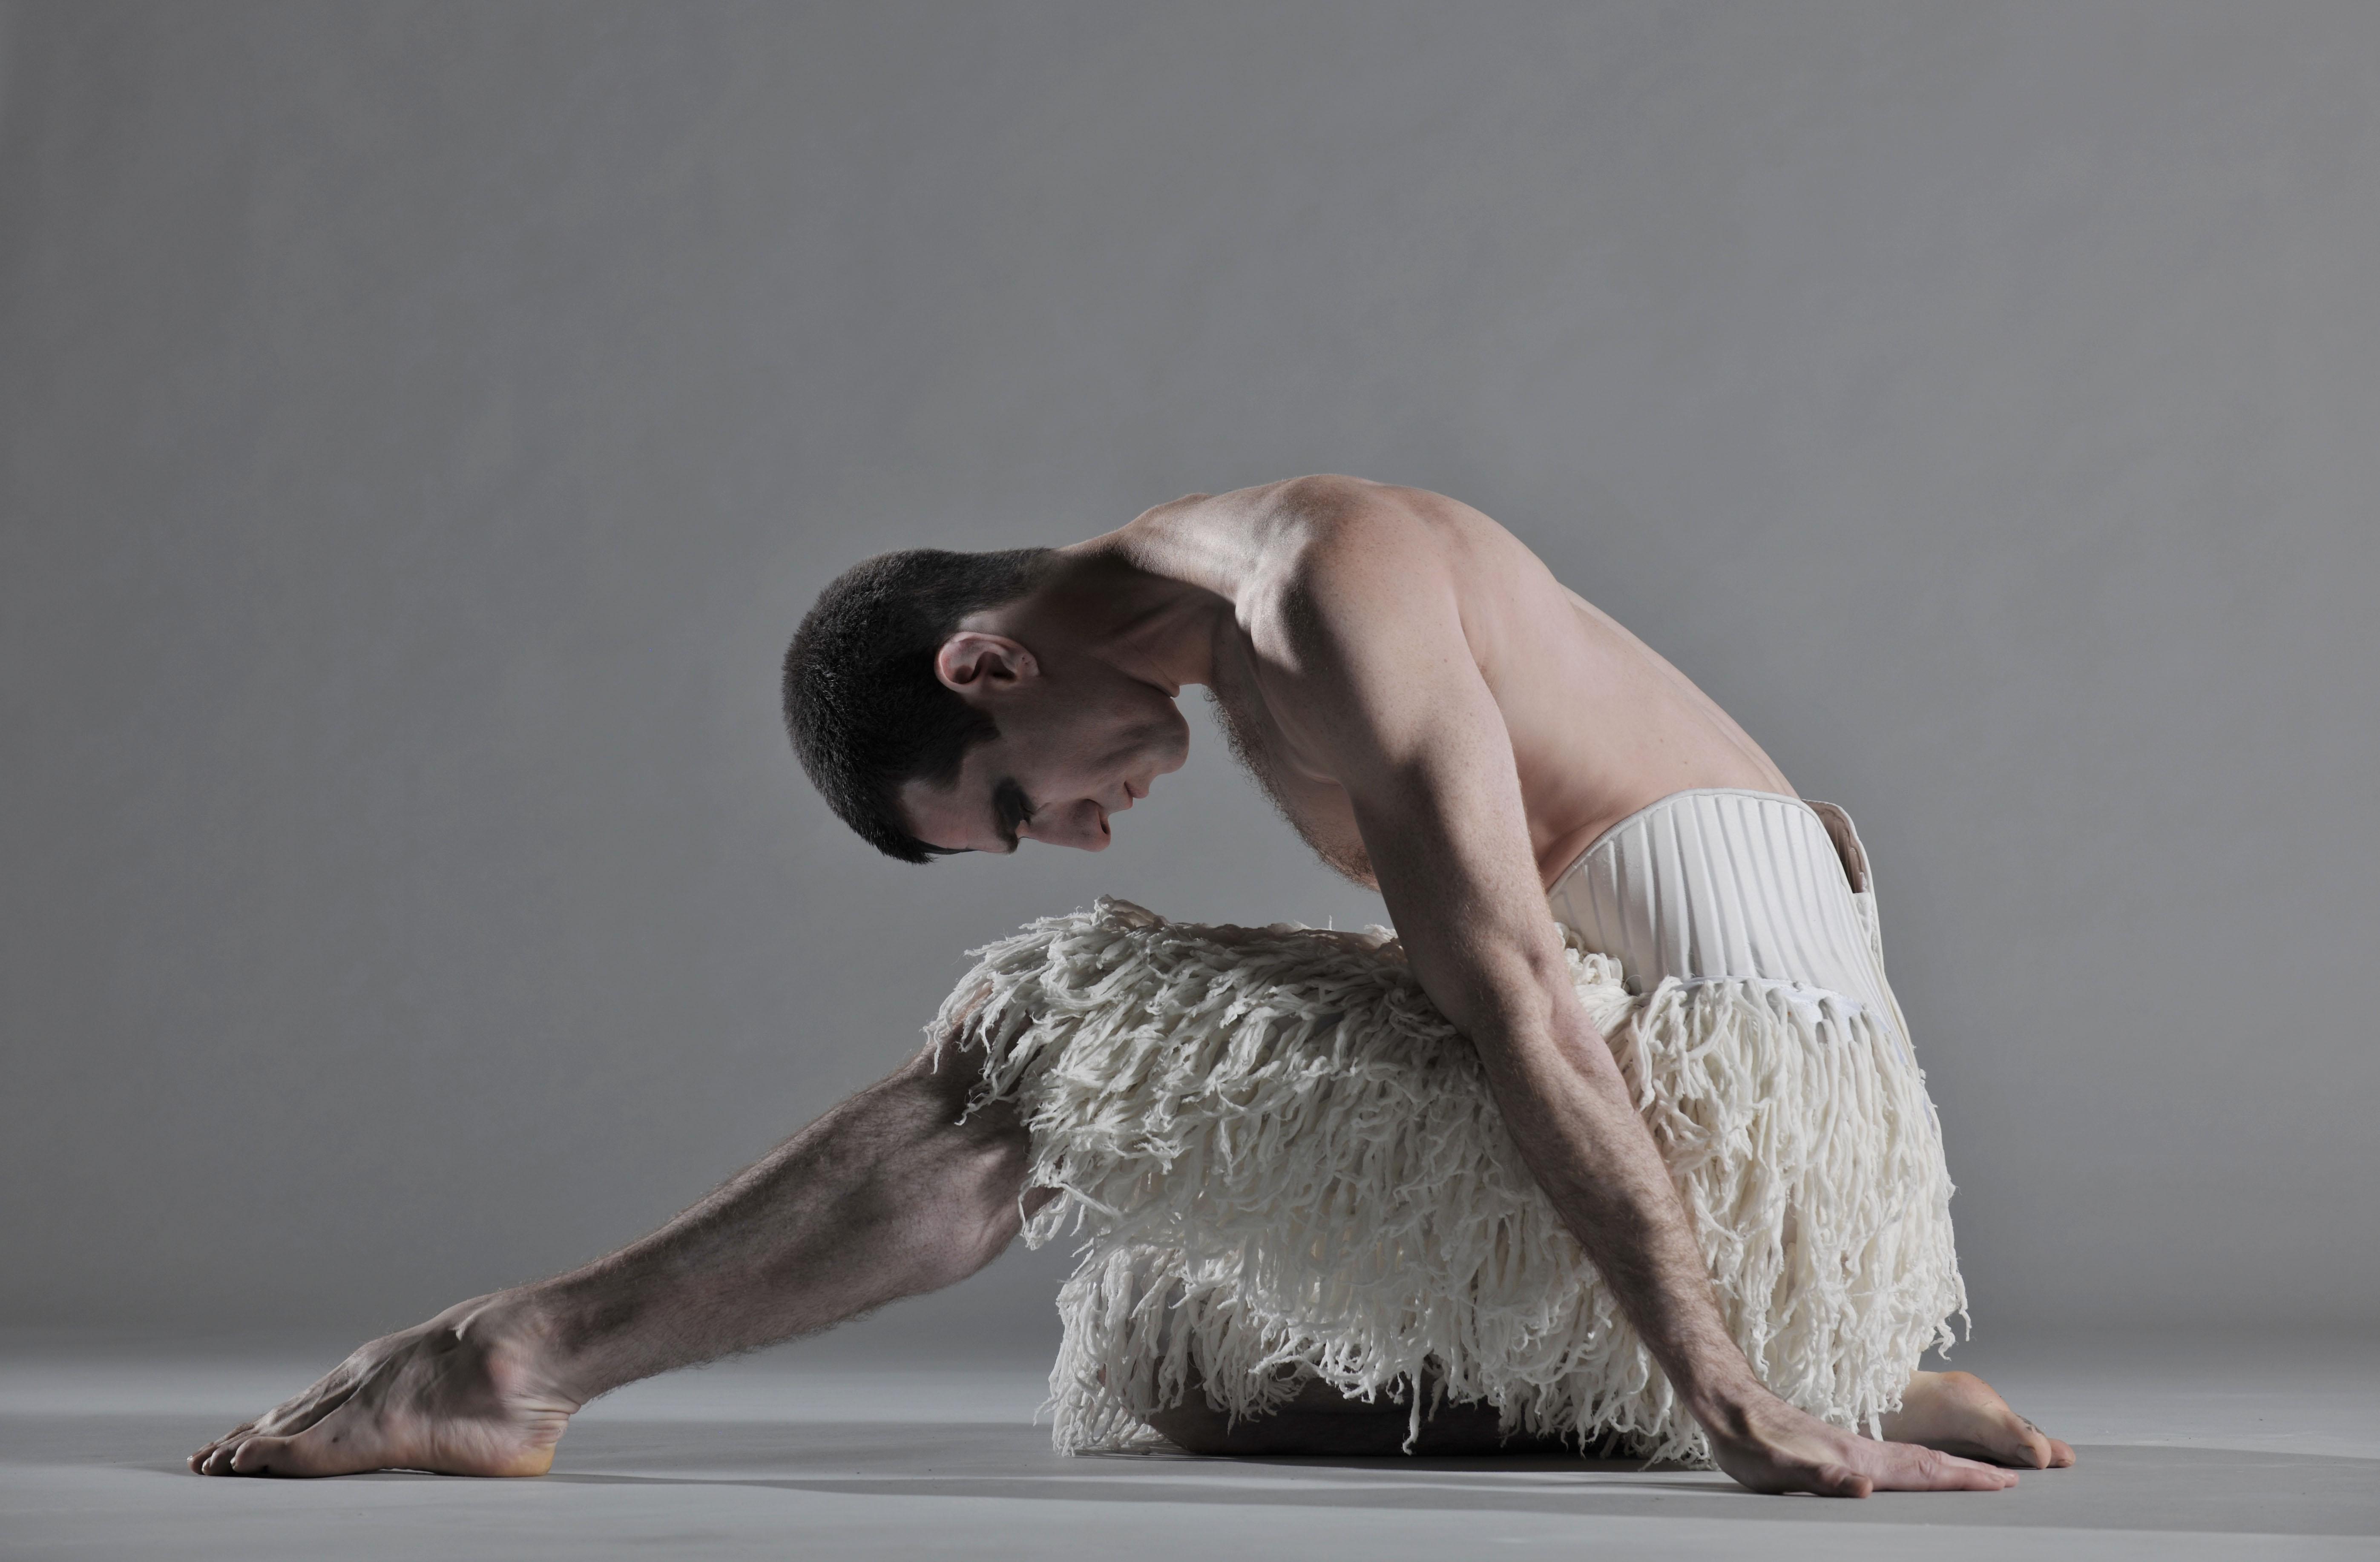 Jonathan Ollivier as The Swan in Matthew Bourne's Swan Lake (Photo by Hugo Glendinning)